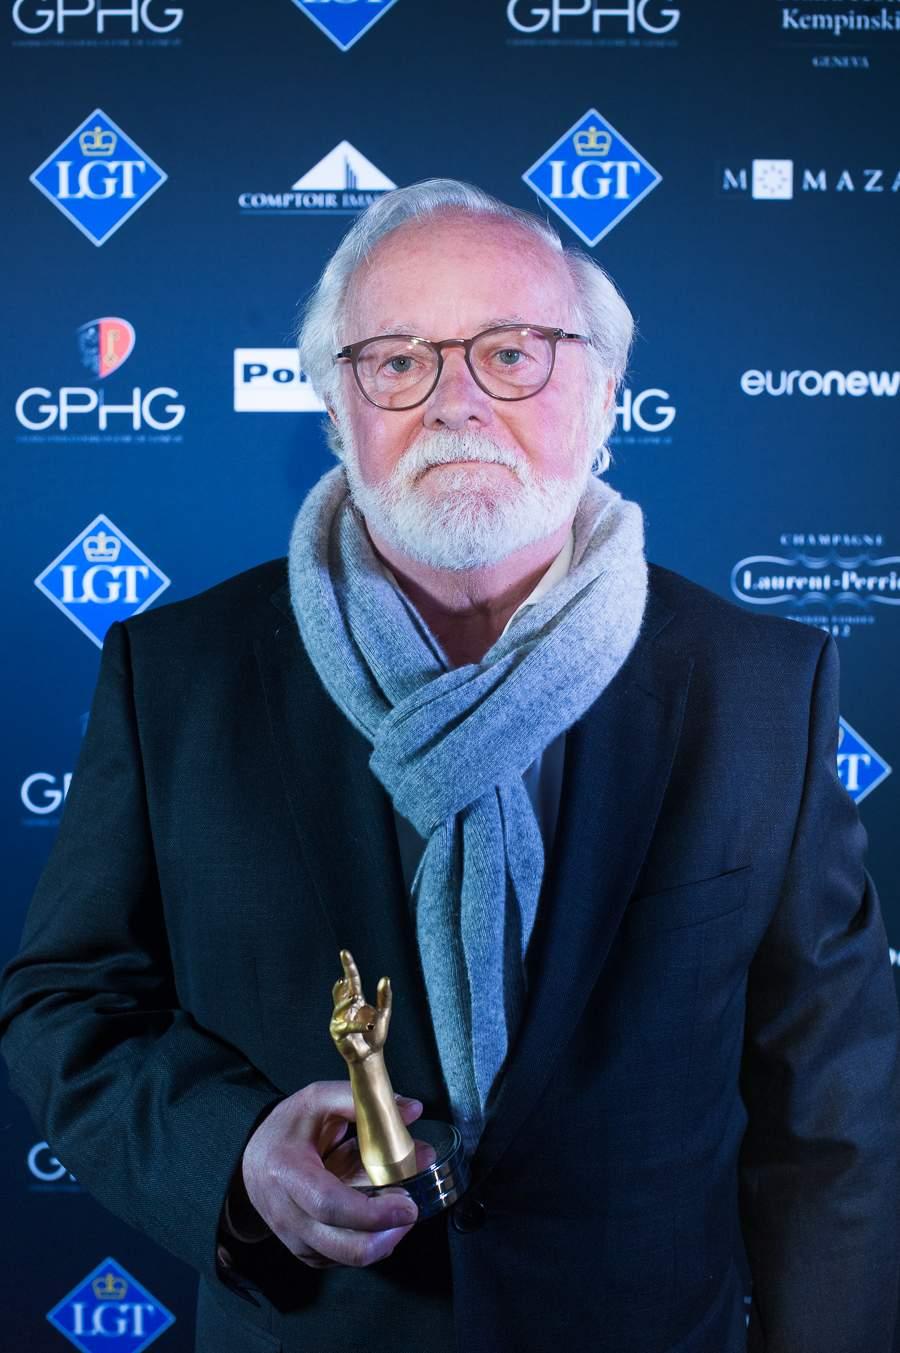 Laurent Ferrier, Founder, winner of the Men's Complication Watch Prize 2018